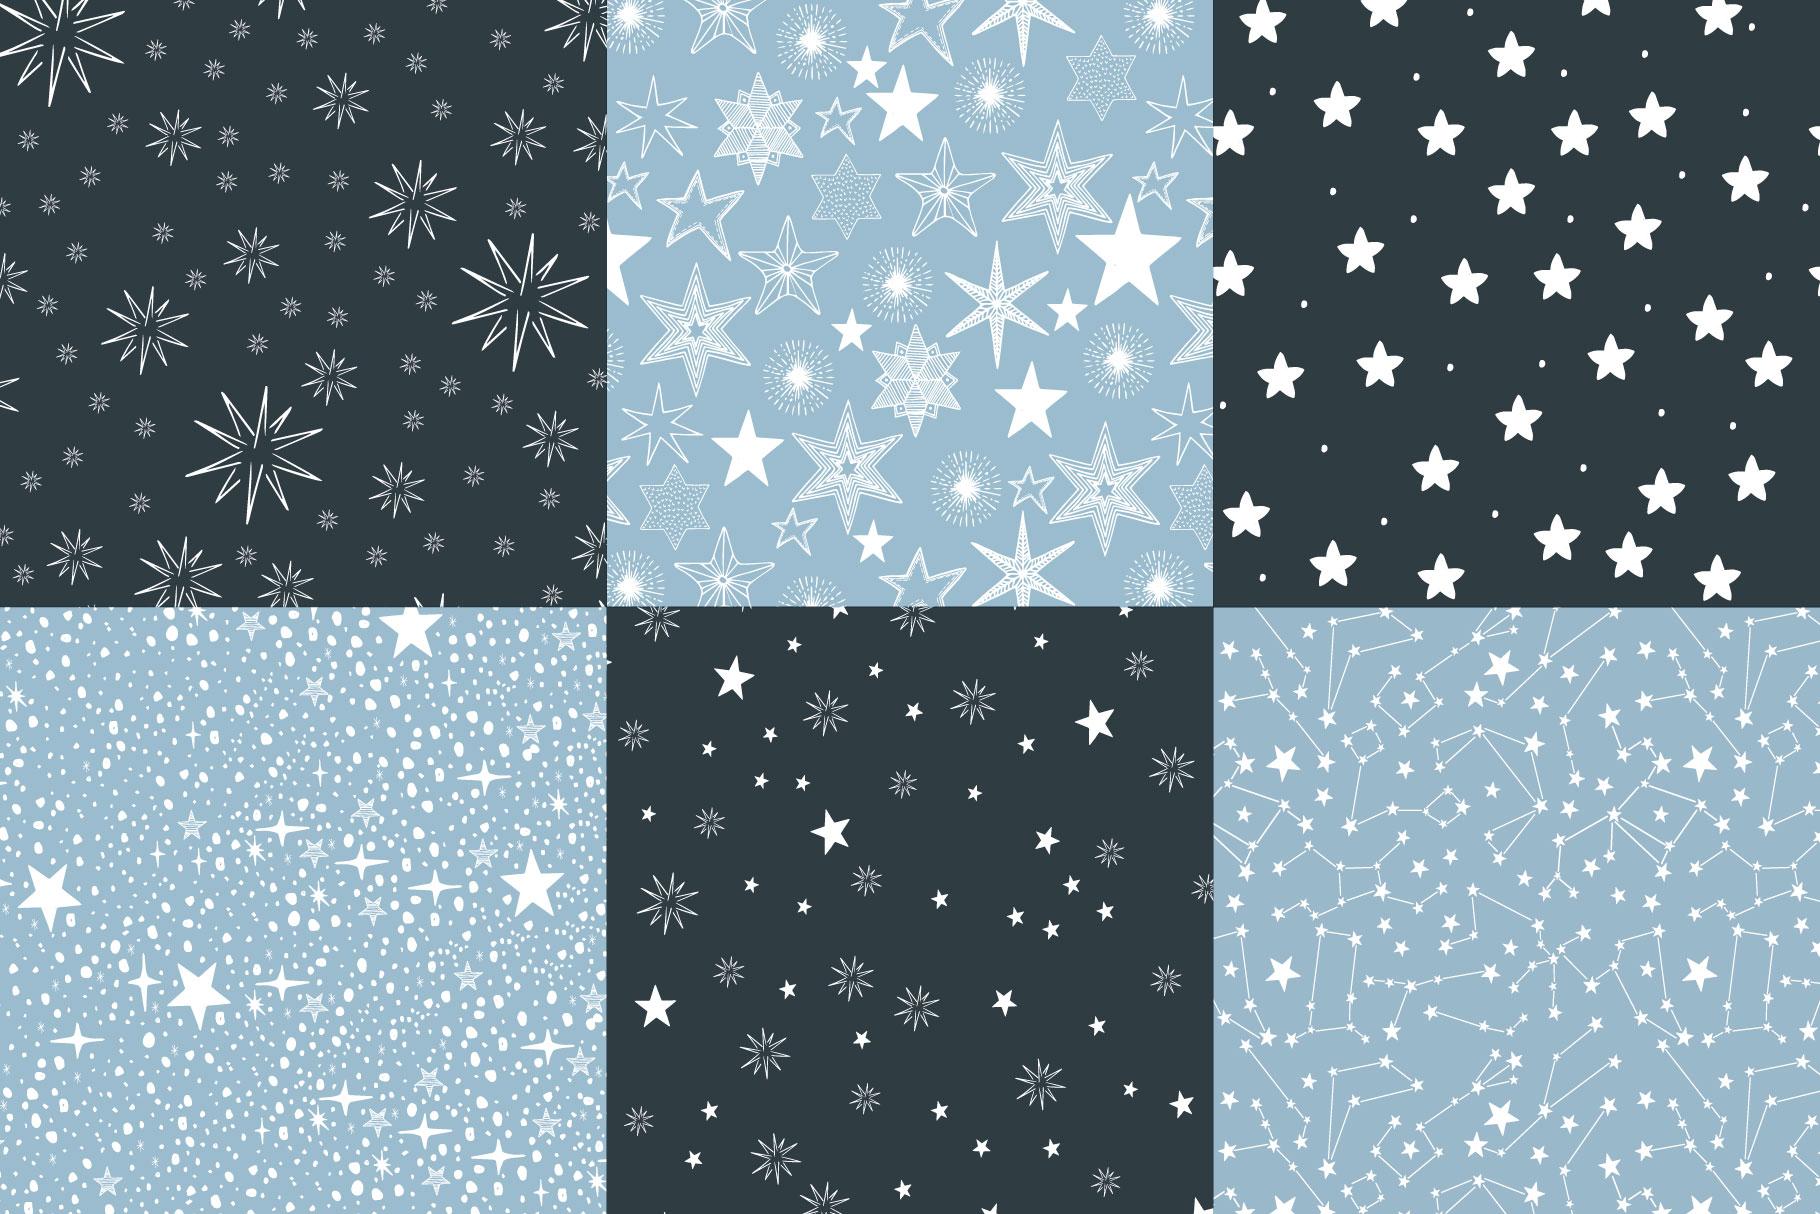 Night Sky Patterns example image 4